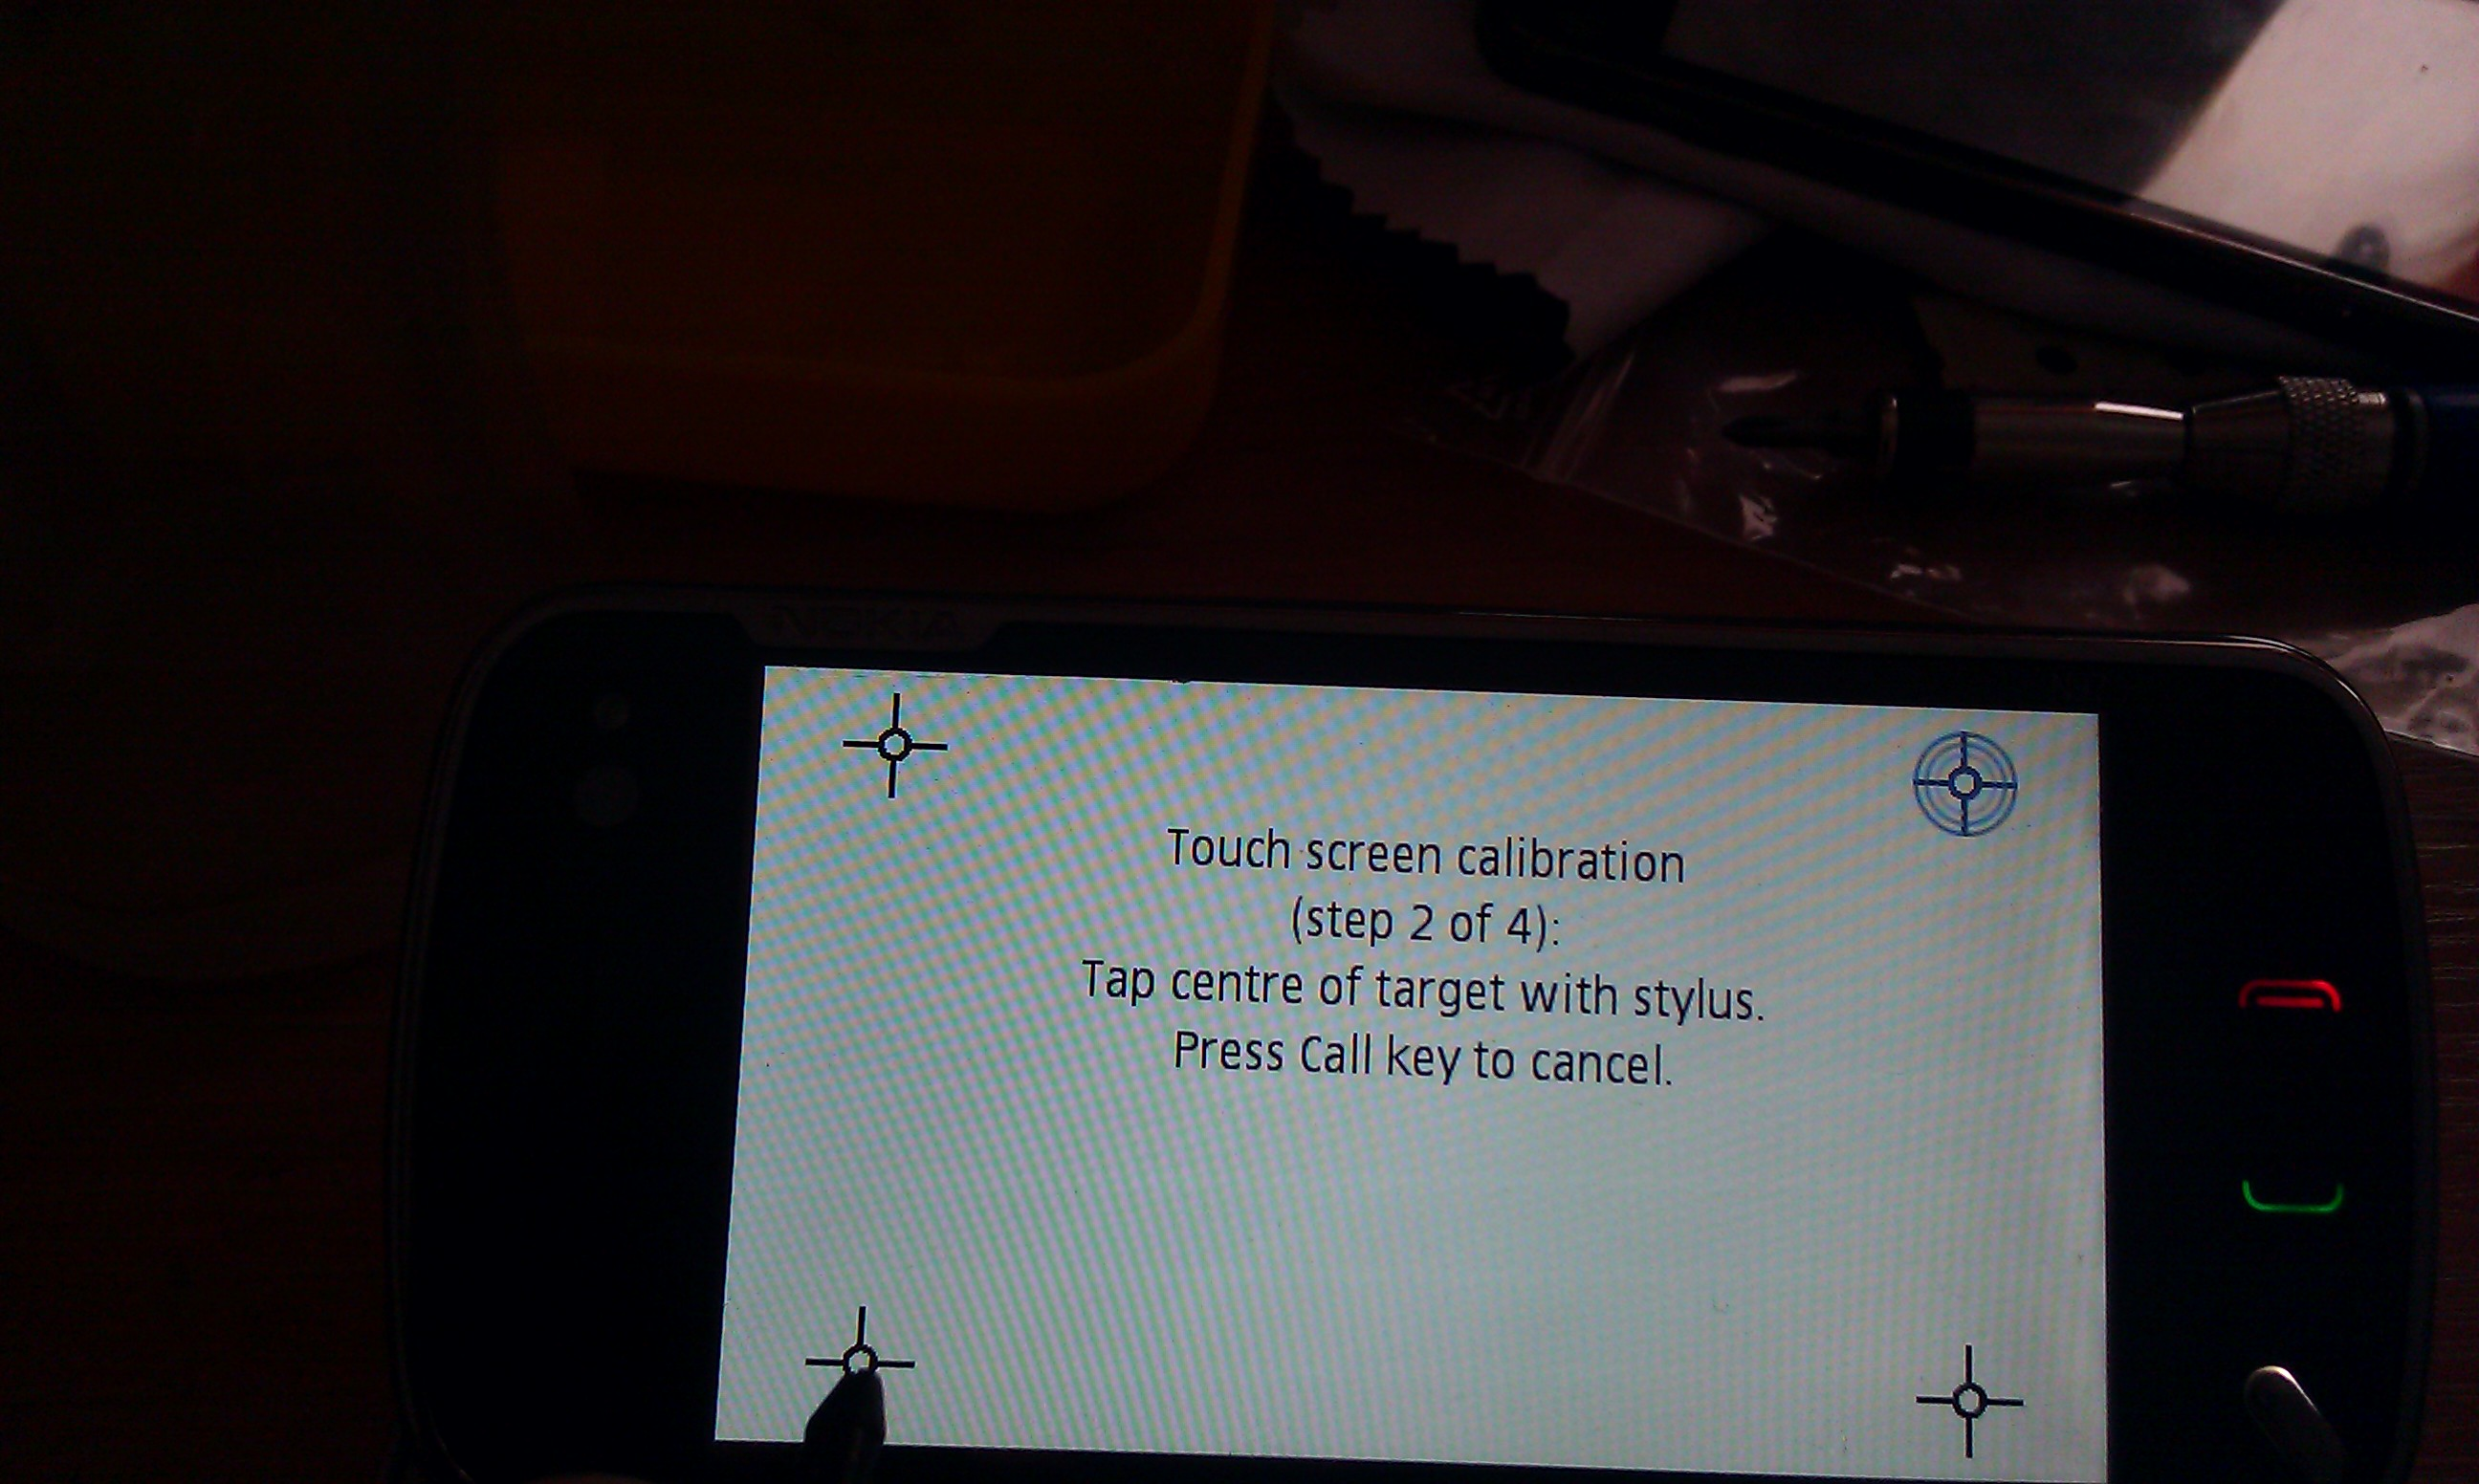 Nokia N97 - nie mo�na skalibrowa� ekranu dotykowego